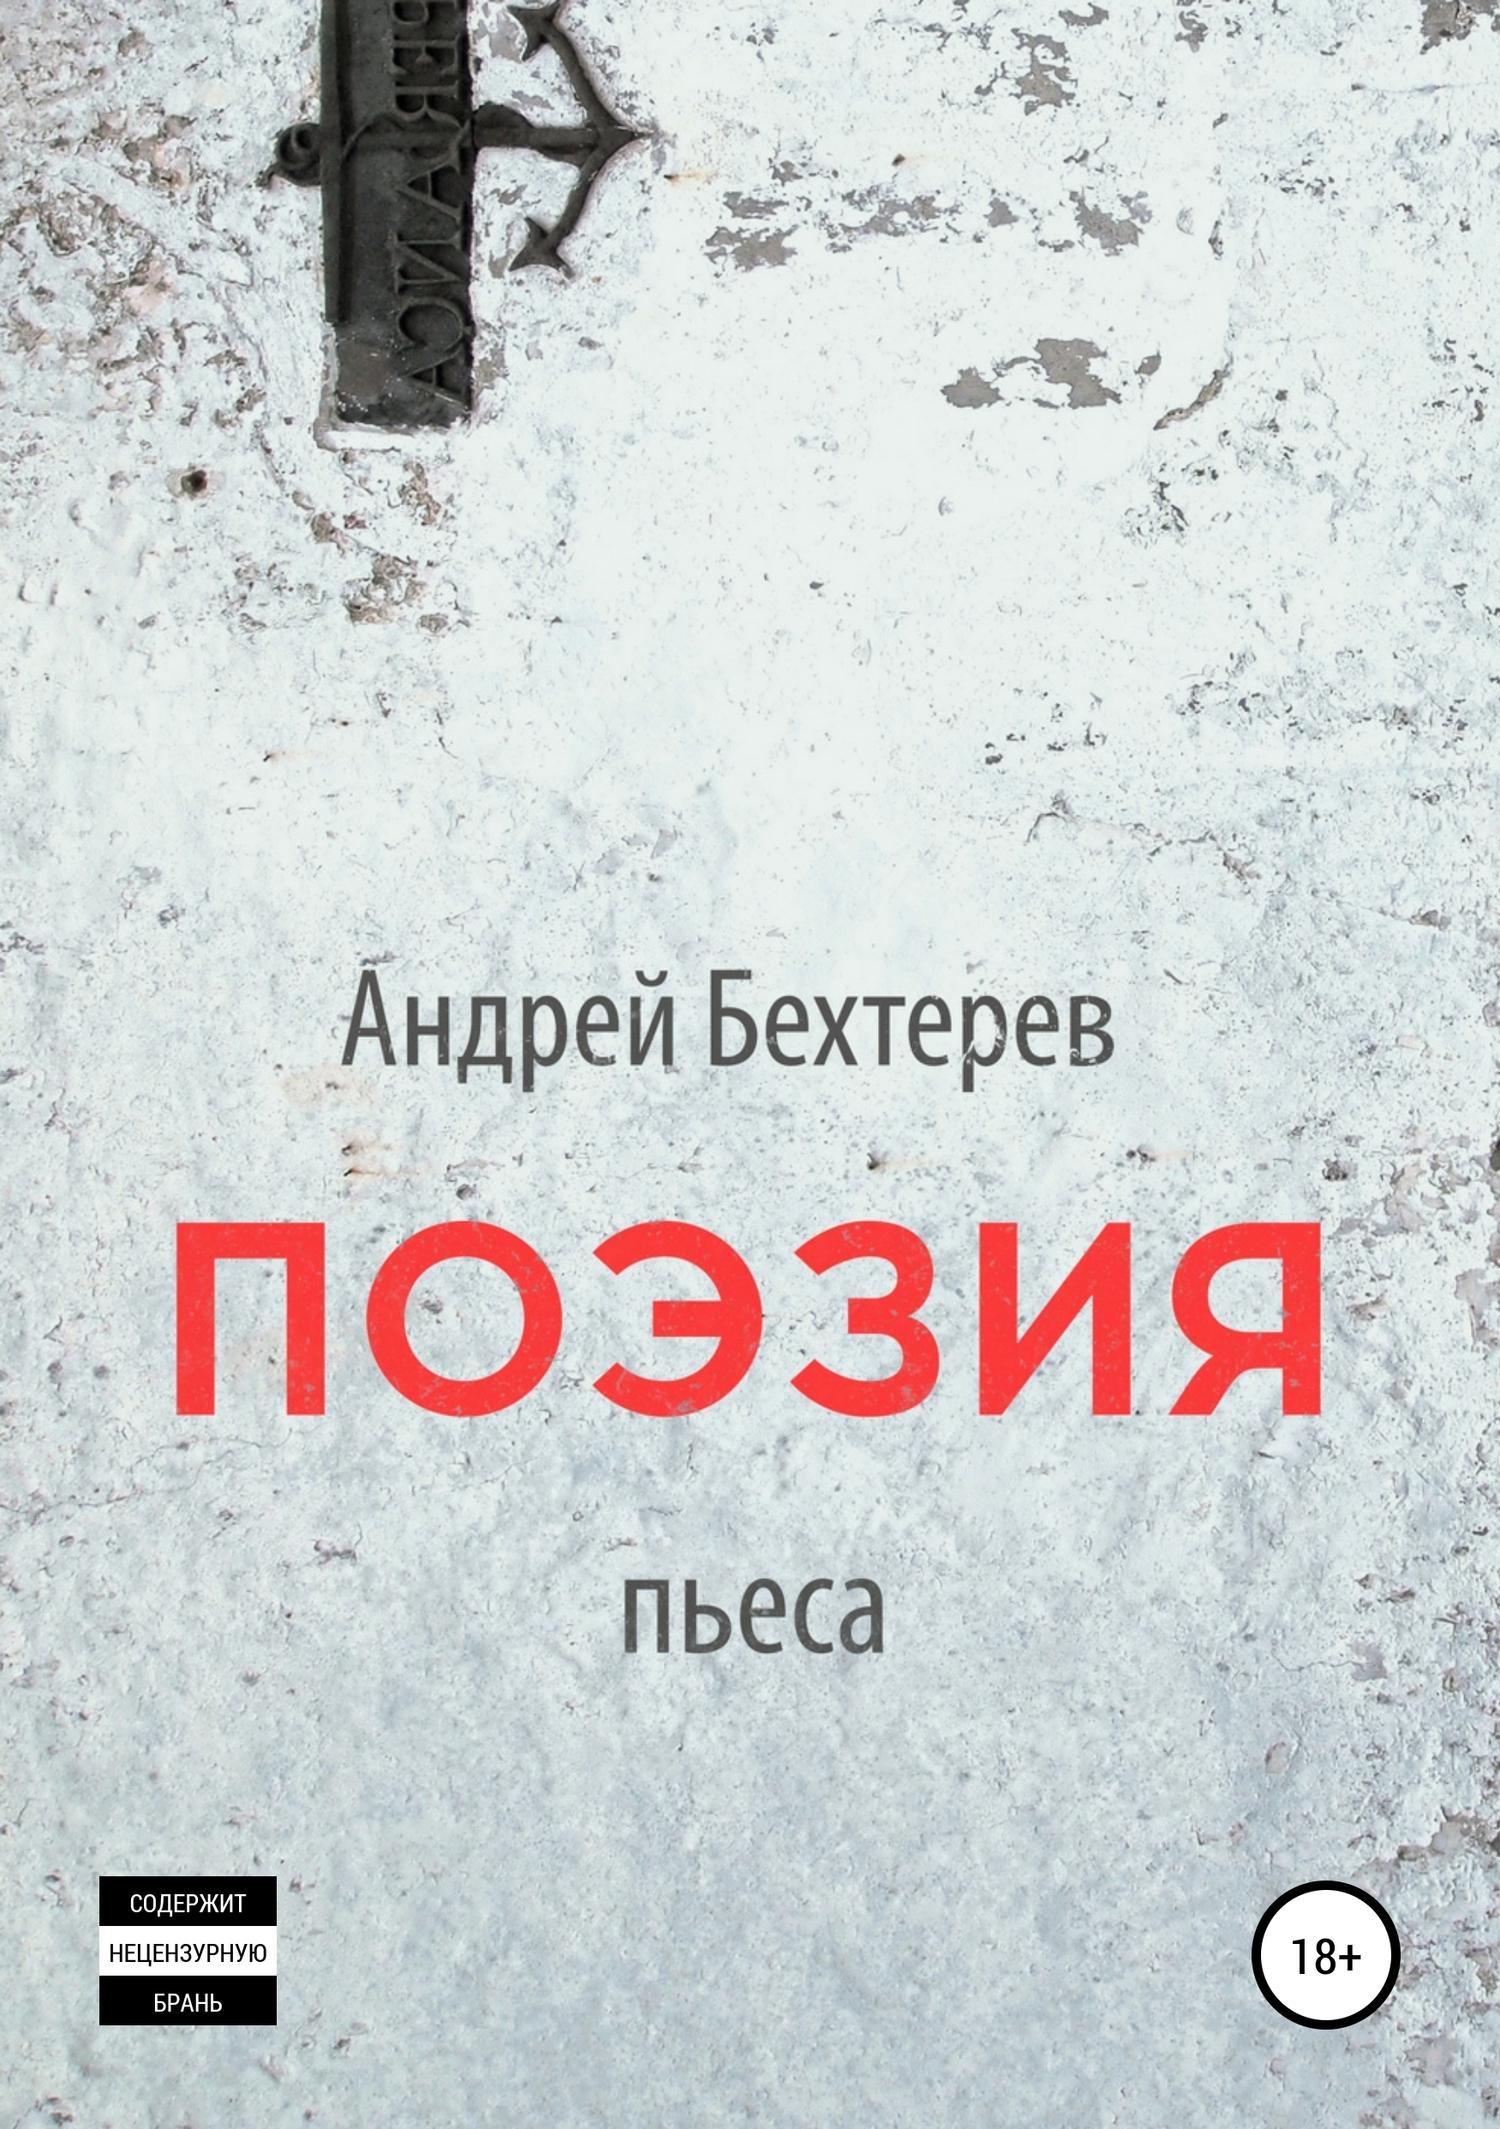 Андрей Бехтерев - Поэзия